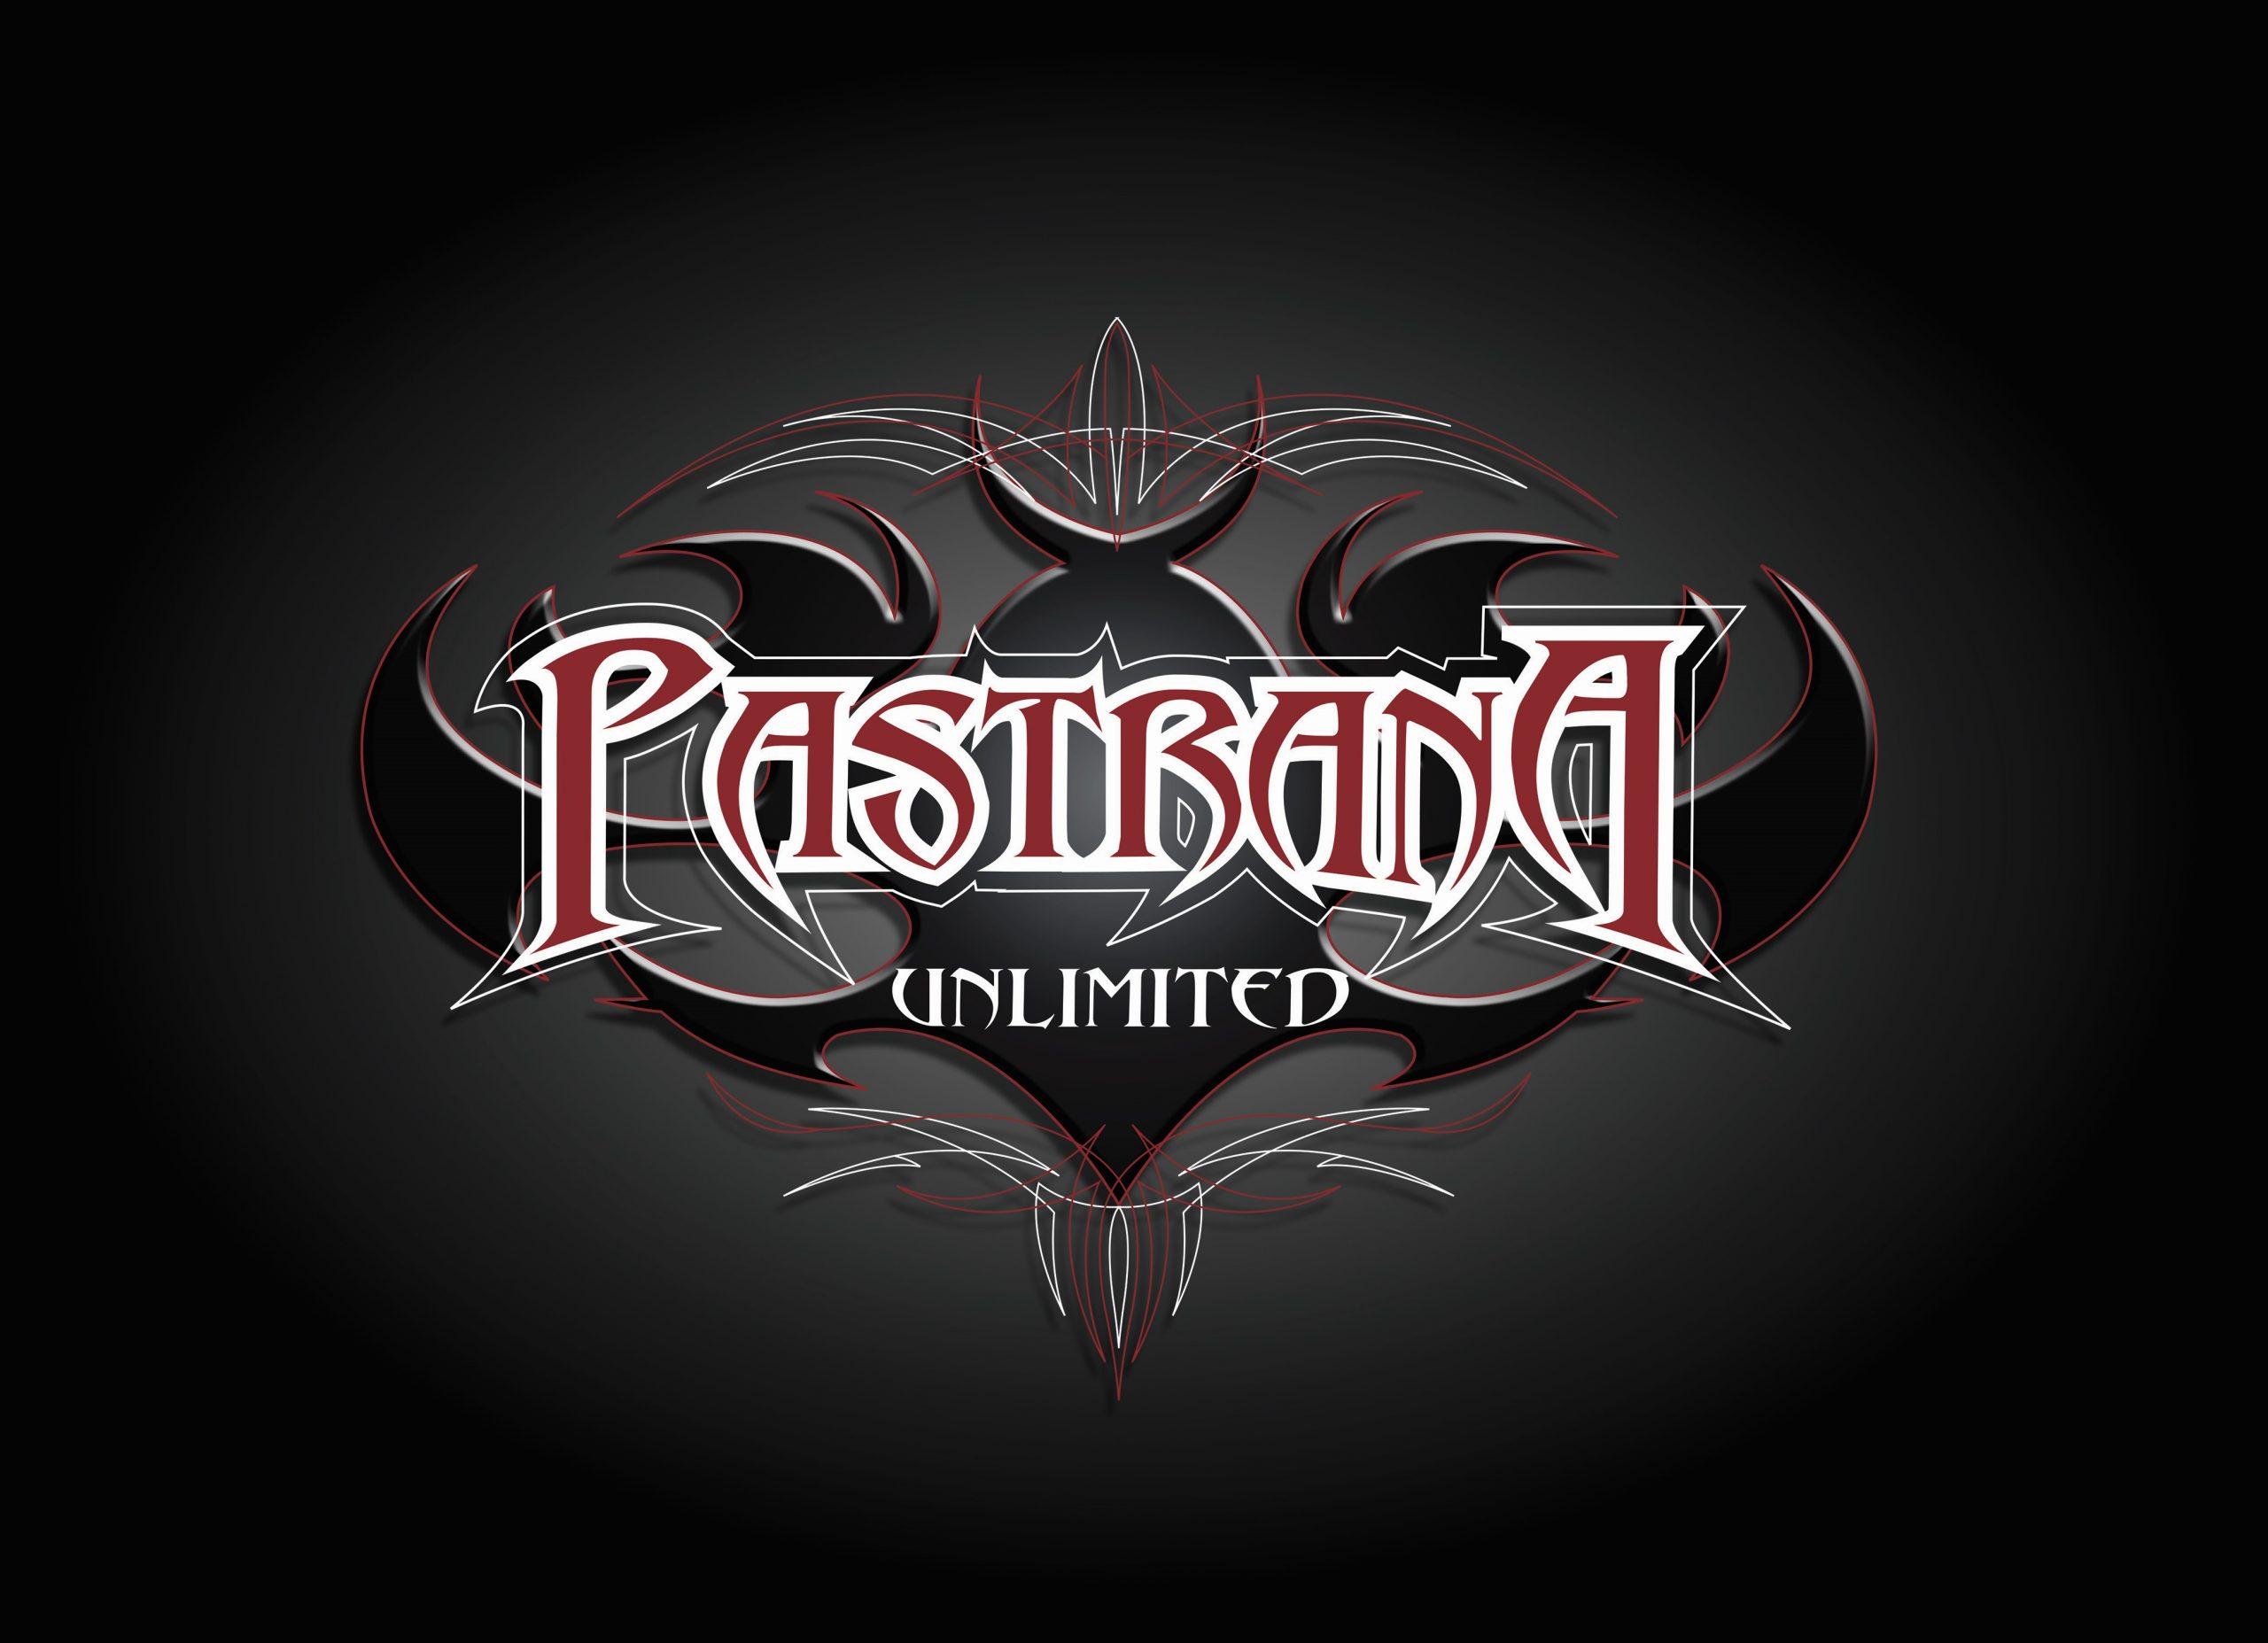 Pastrana.Unlimited